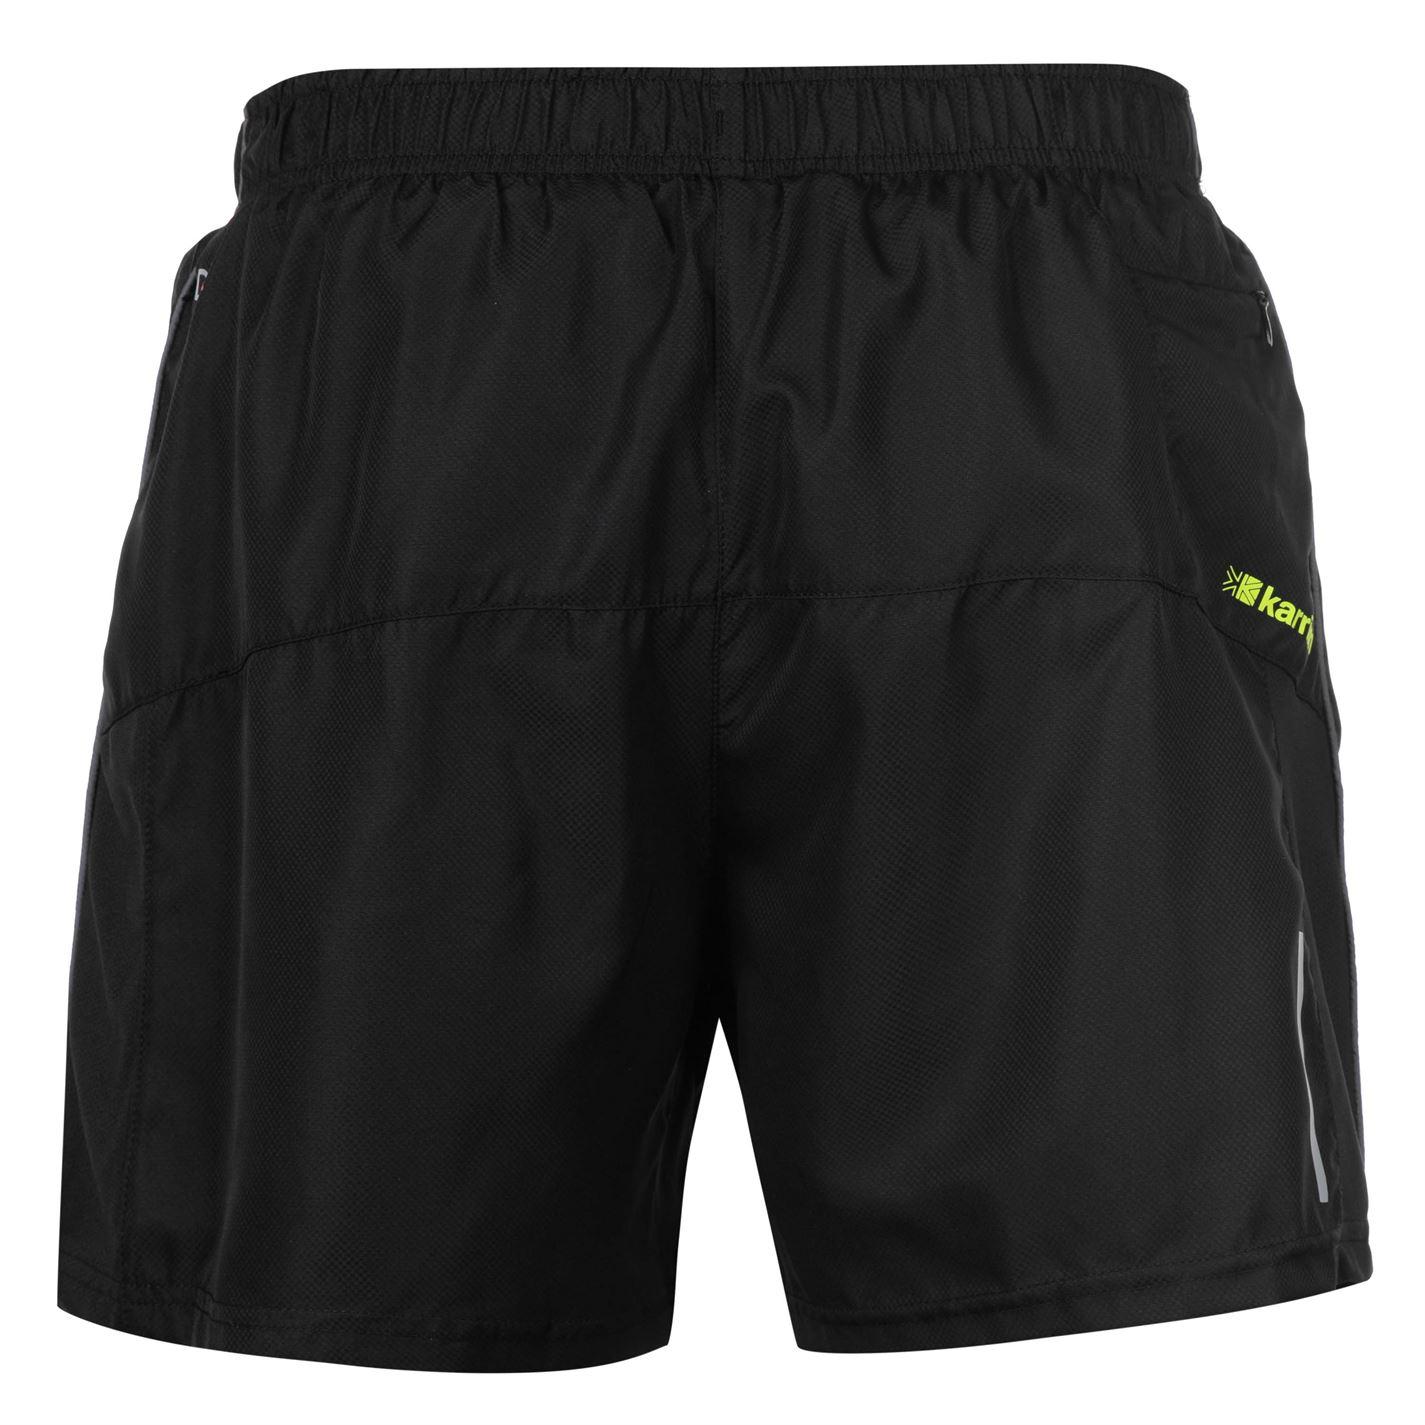 Karrimor-Xlite-5inch-Running-Shorts-Performance-Mens thumbnail 6